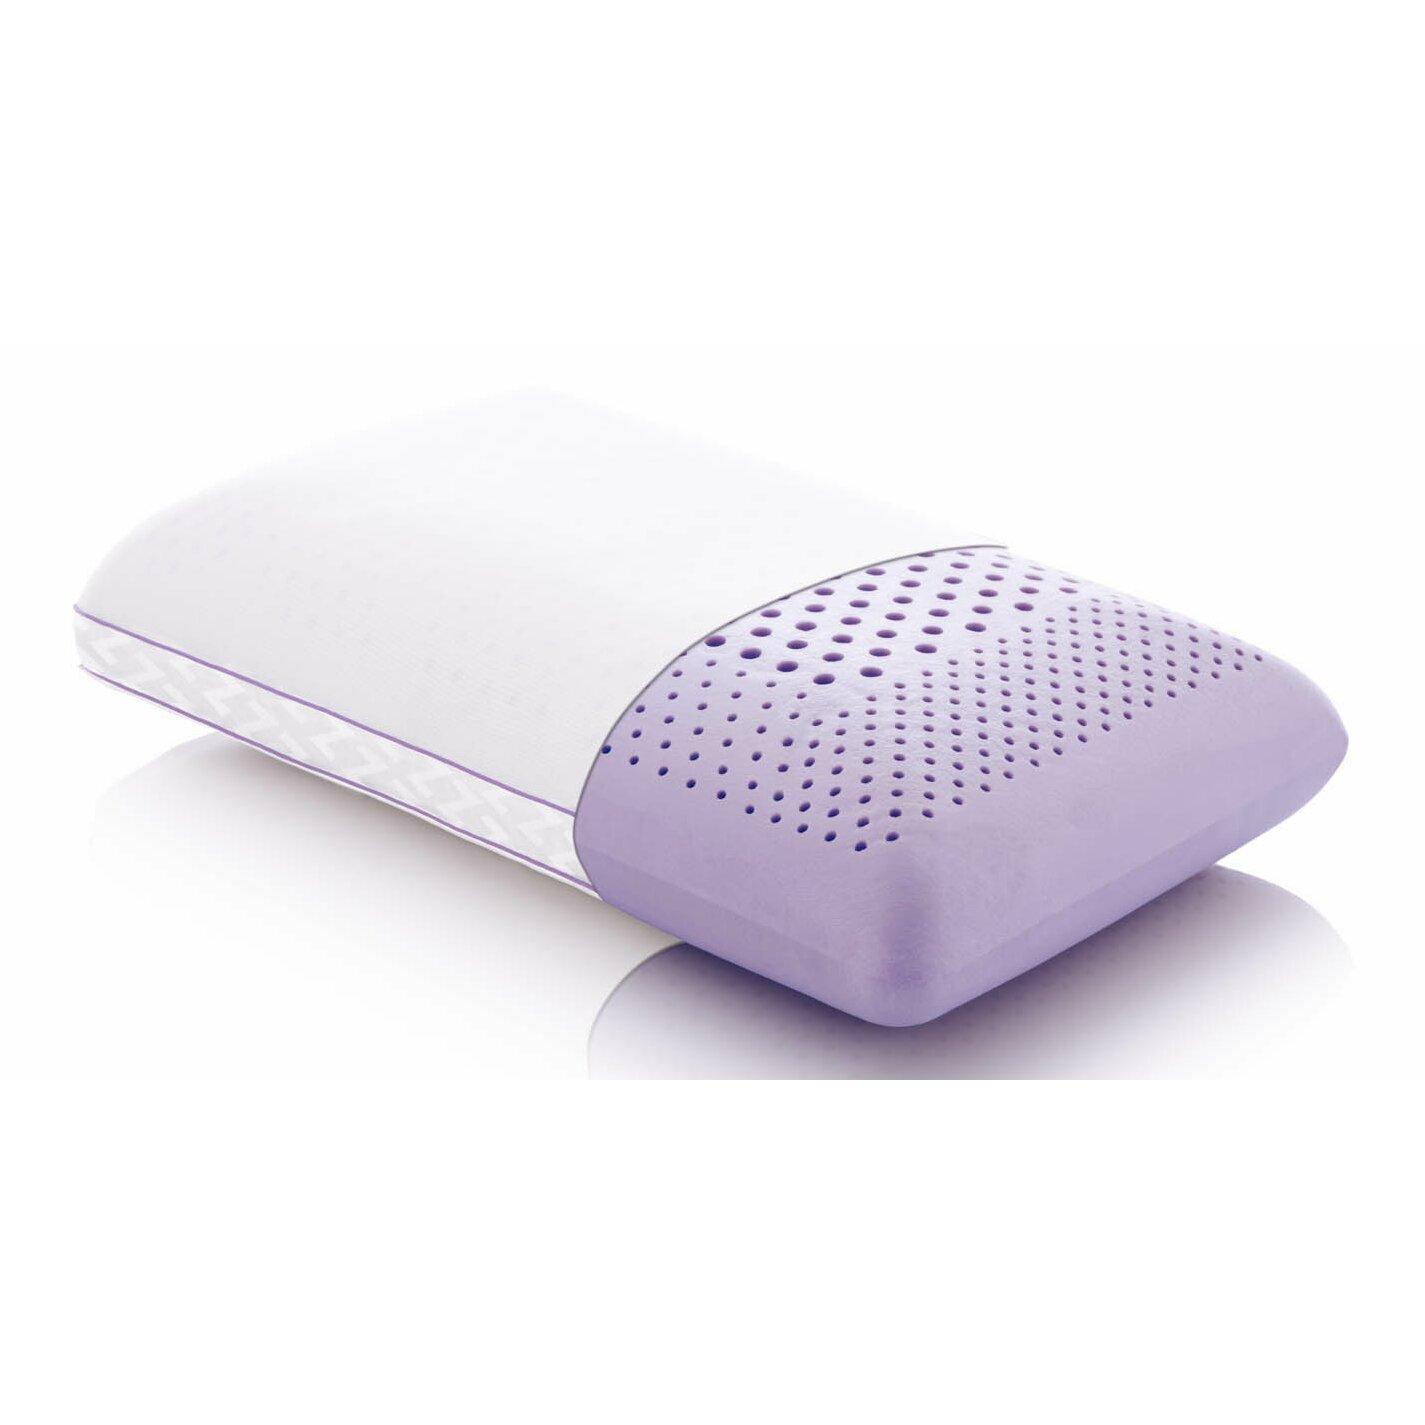 Malouf Z Zoned Dough Lavender Oil Infused Memory Foam